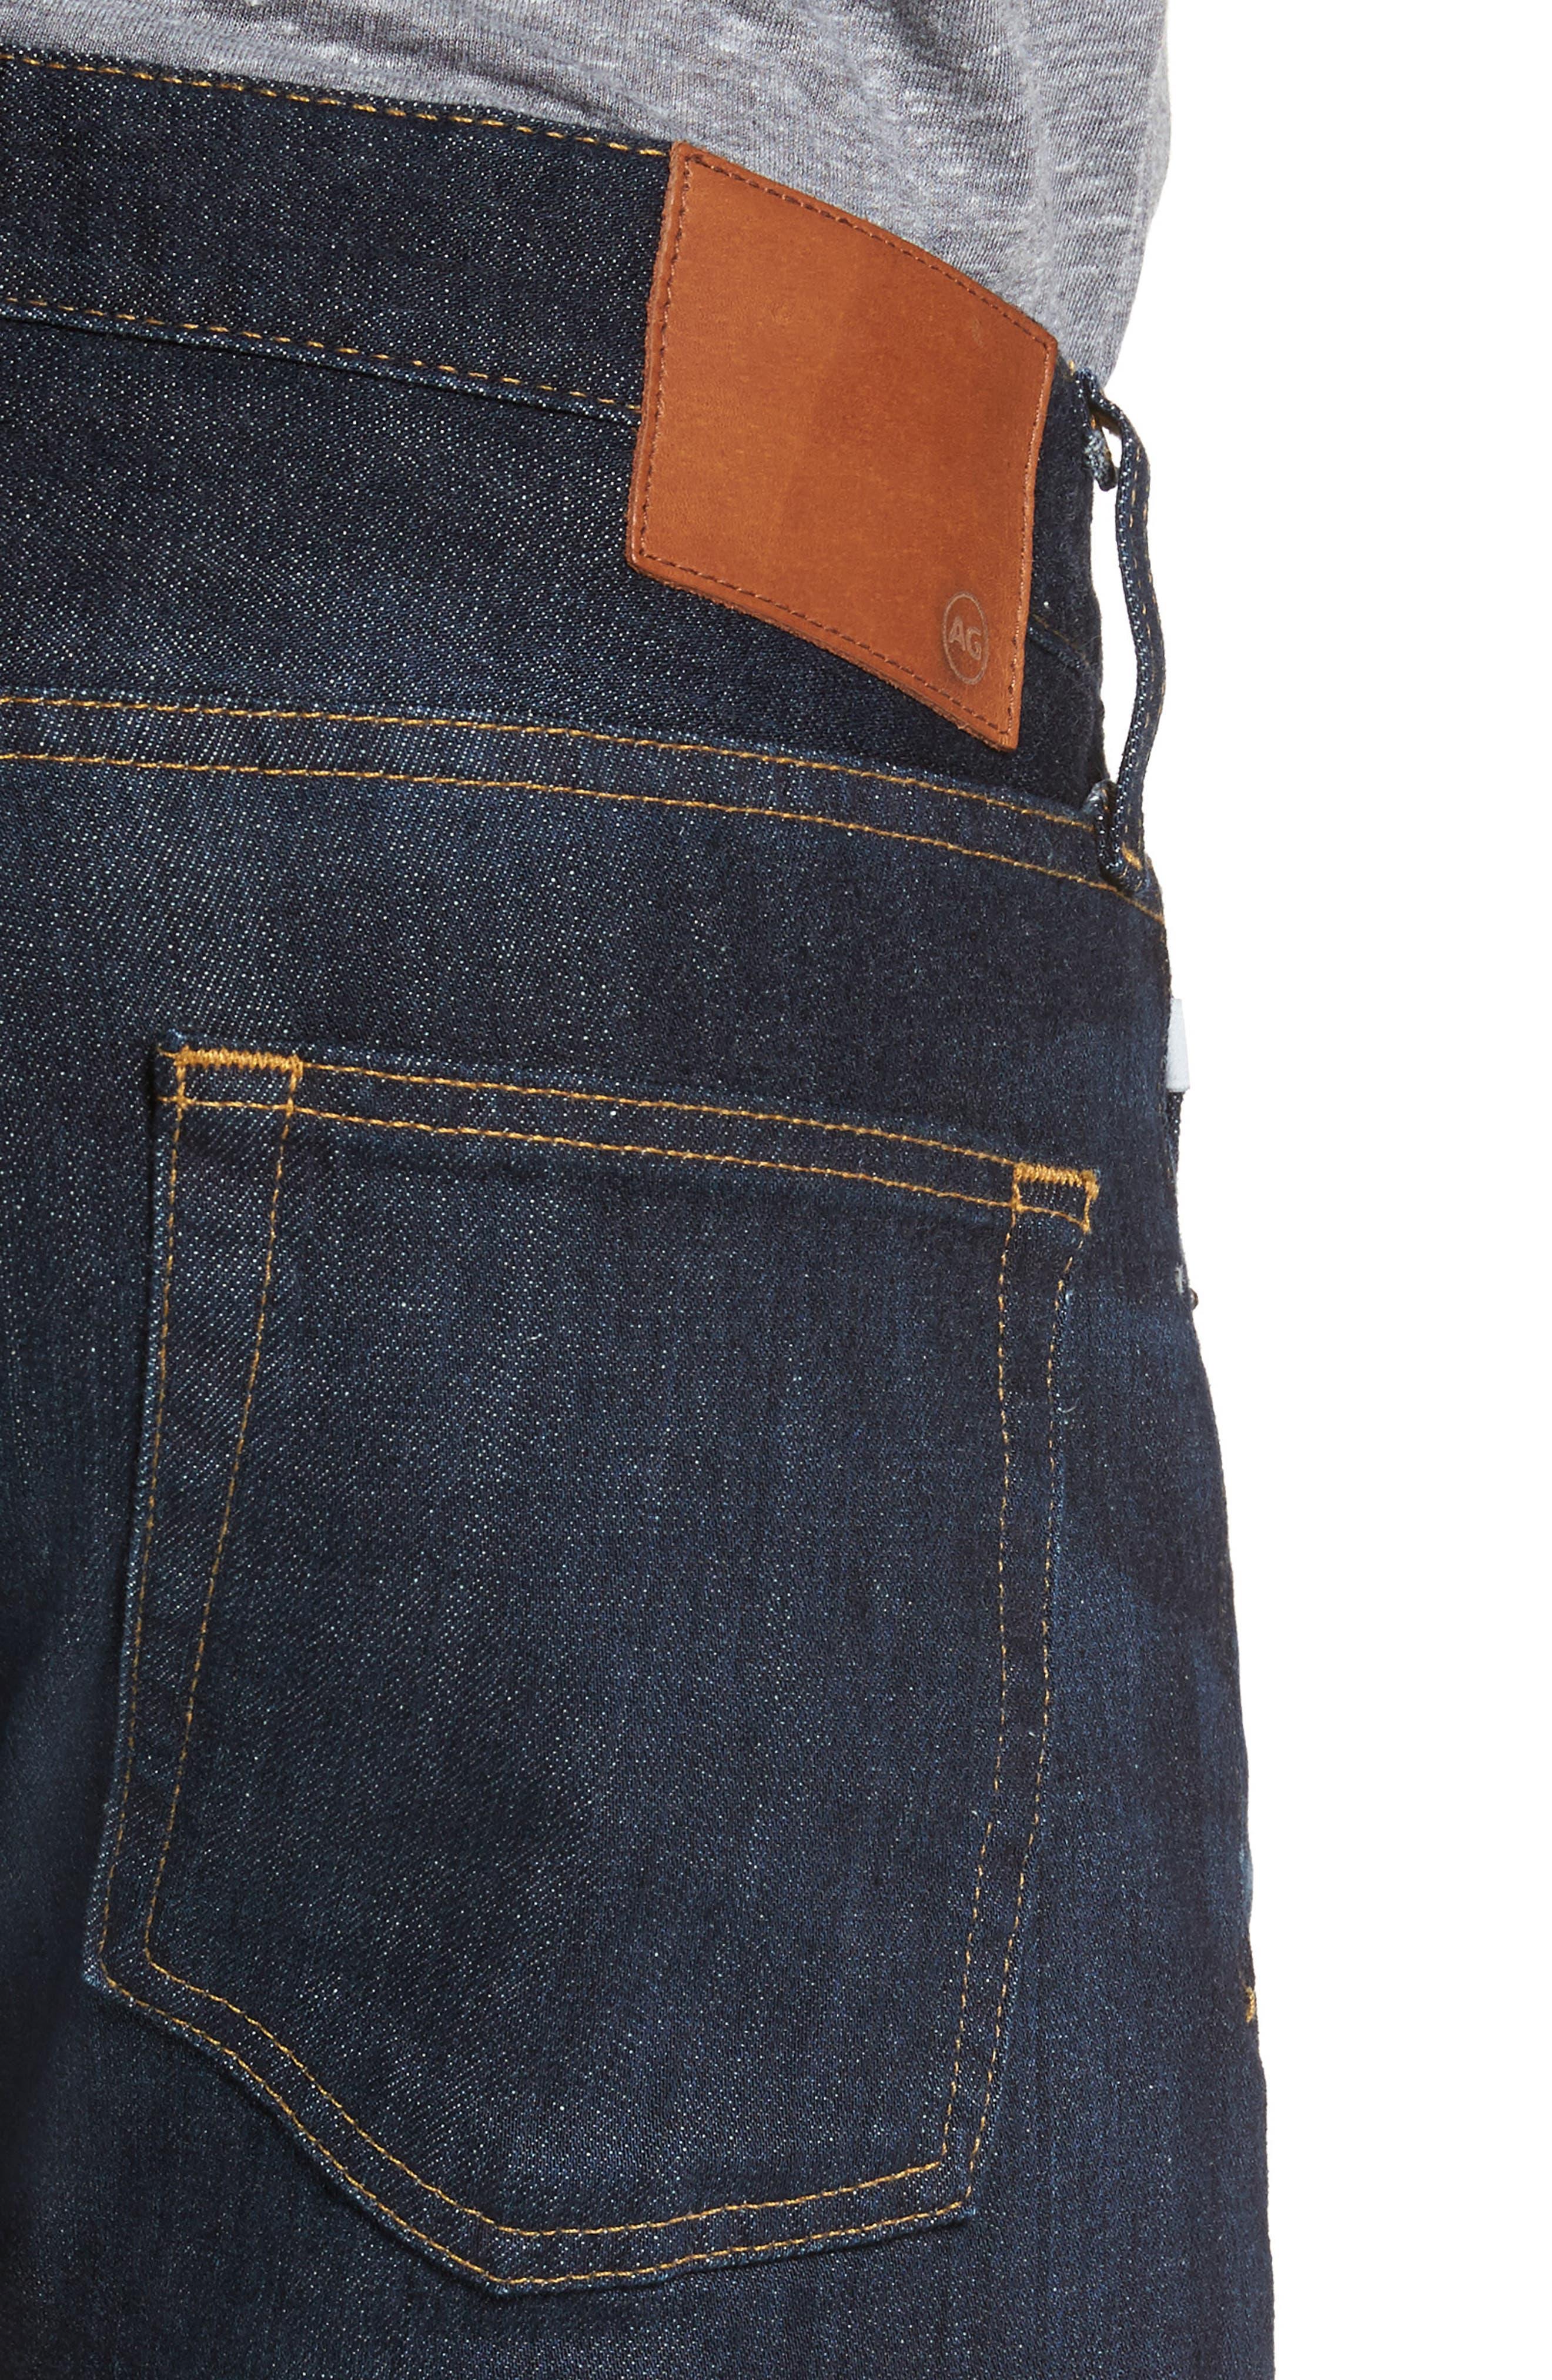 Tellis Slim Fit Jeans,                             Alternate thumbnail 4, color,                             2 Years Jinx